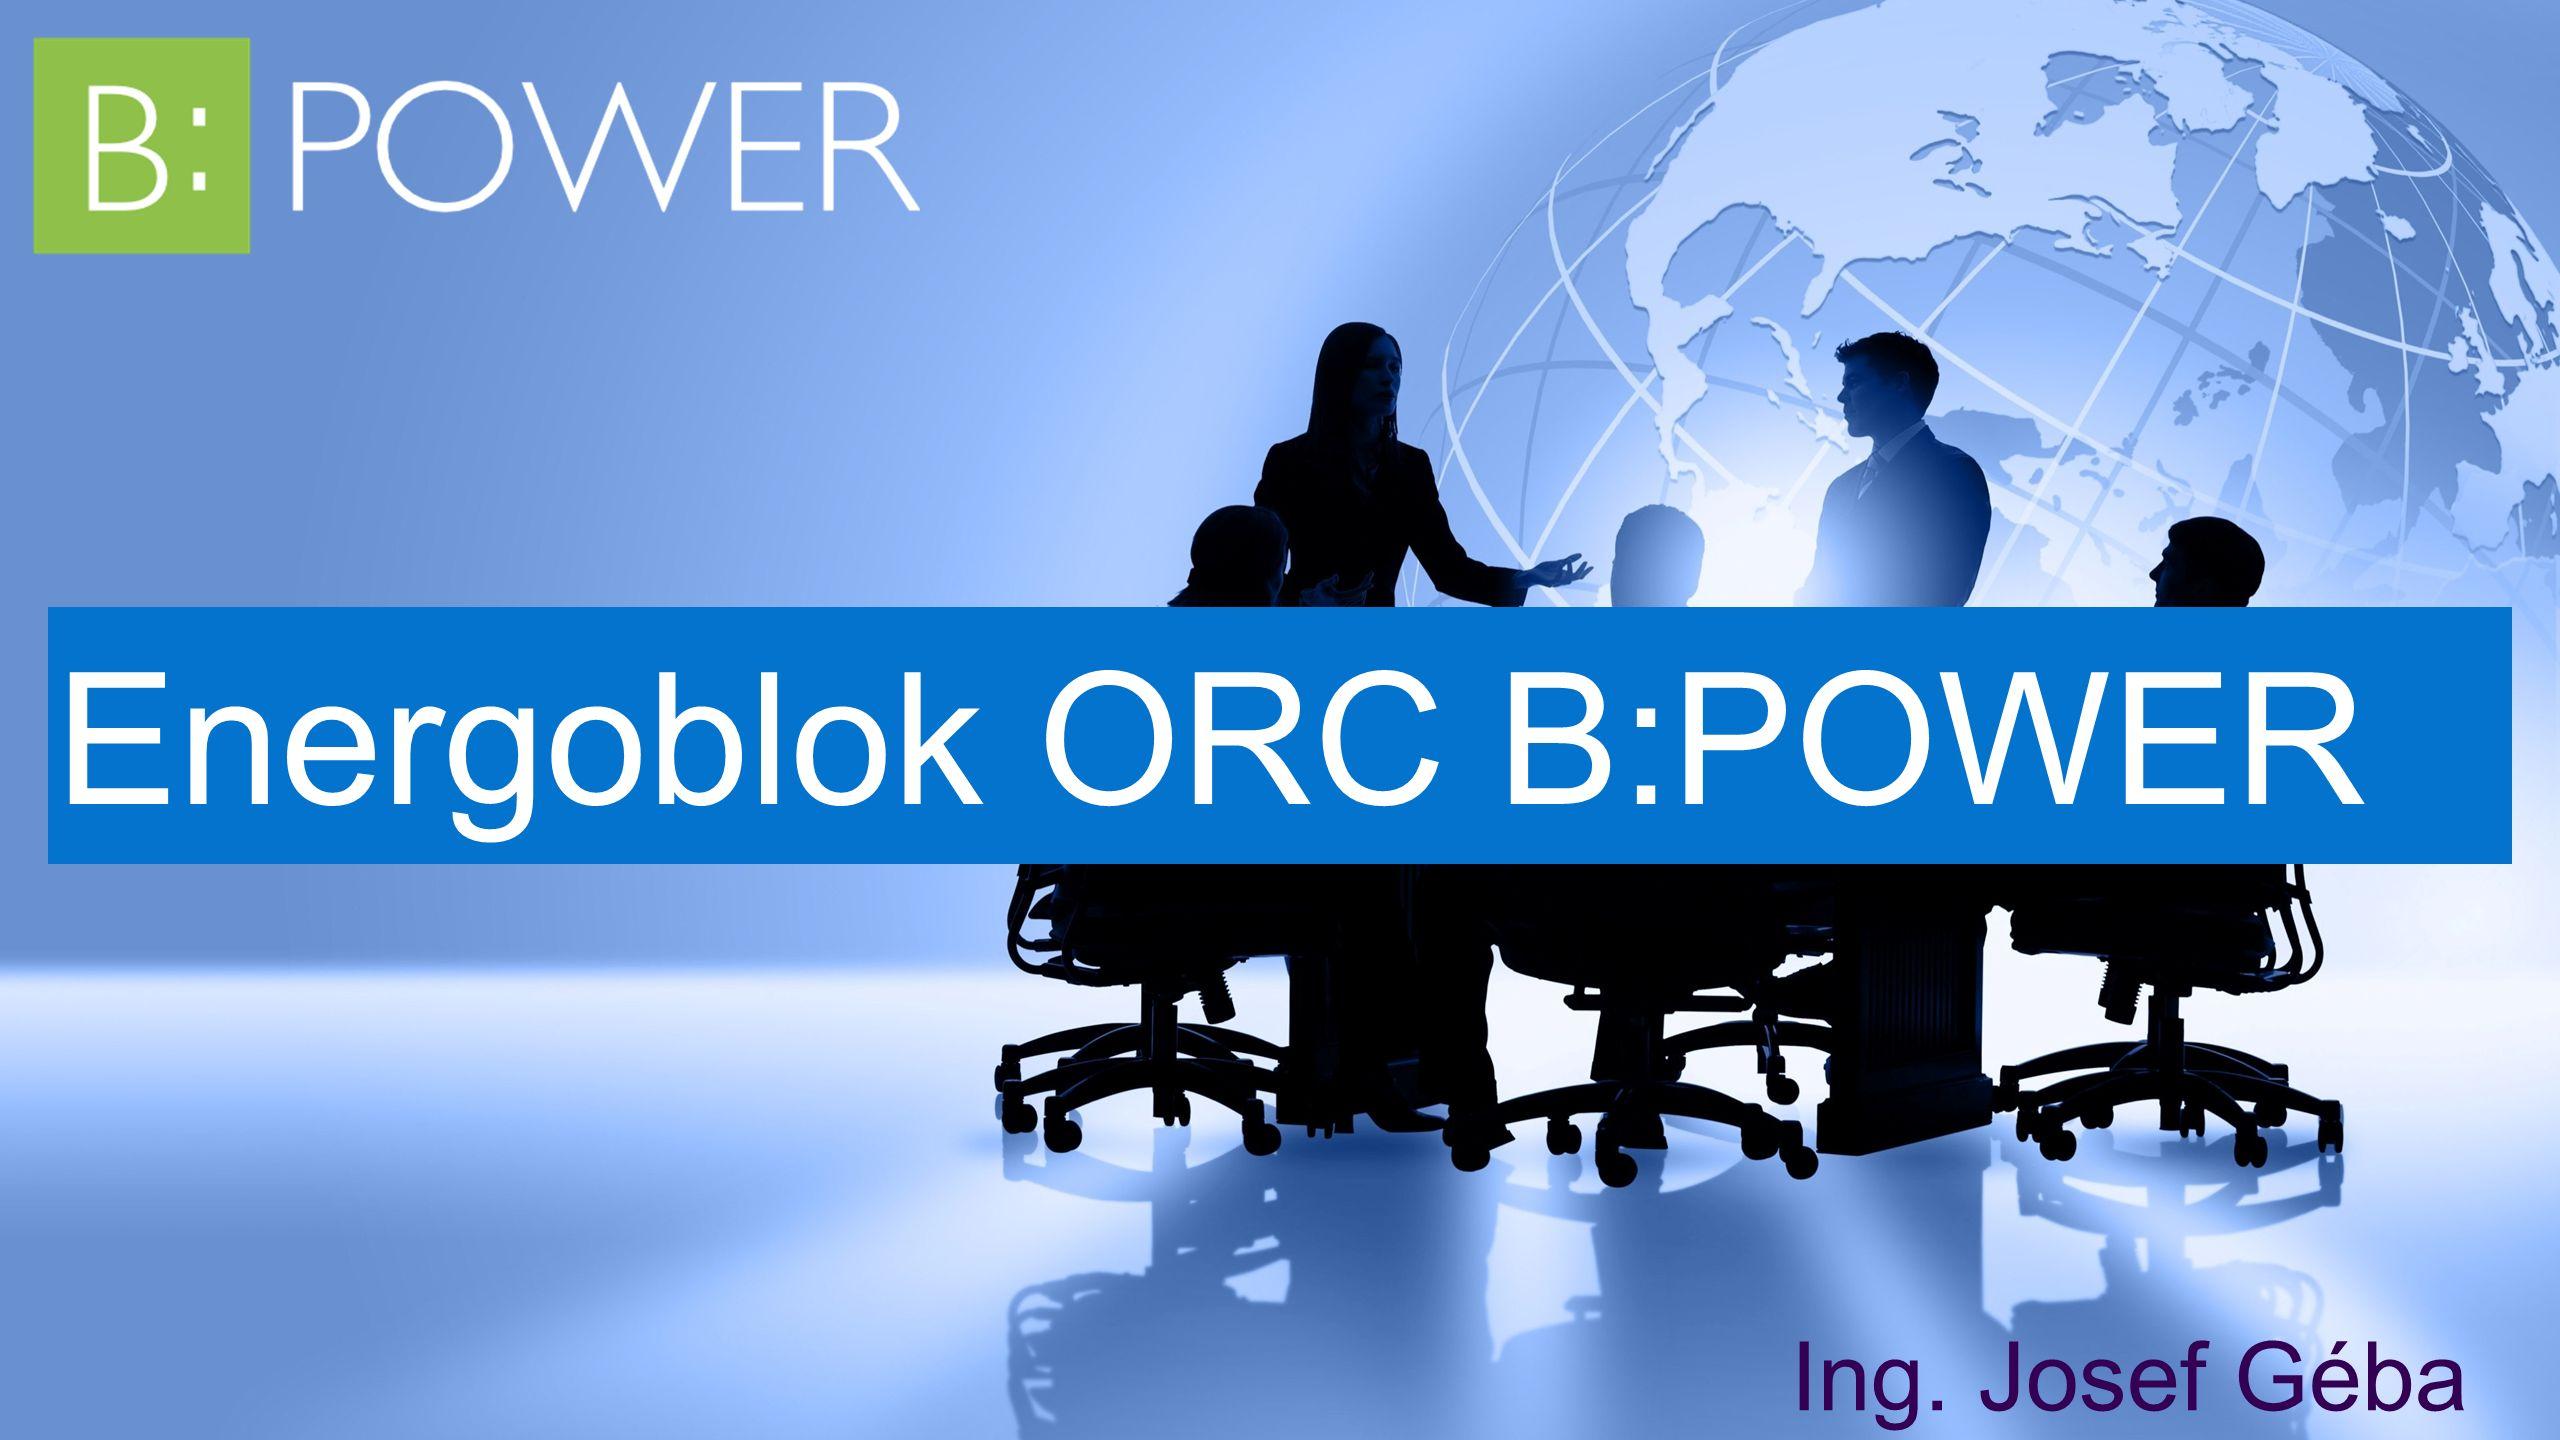 Energoblok ORC B:POWER Ing. Josef Géba